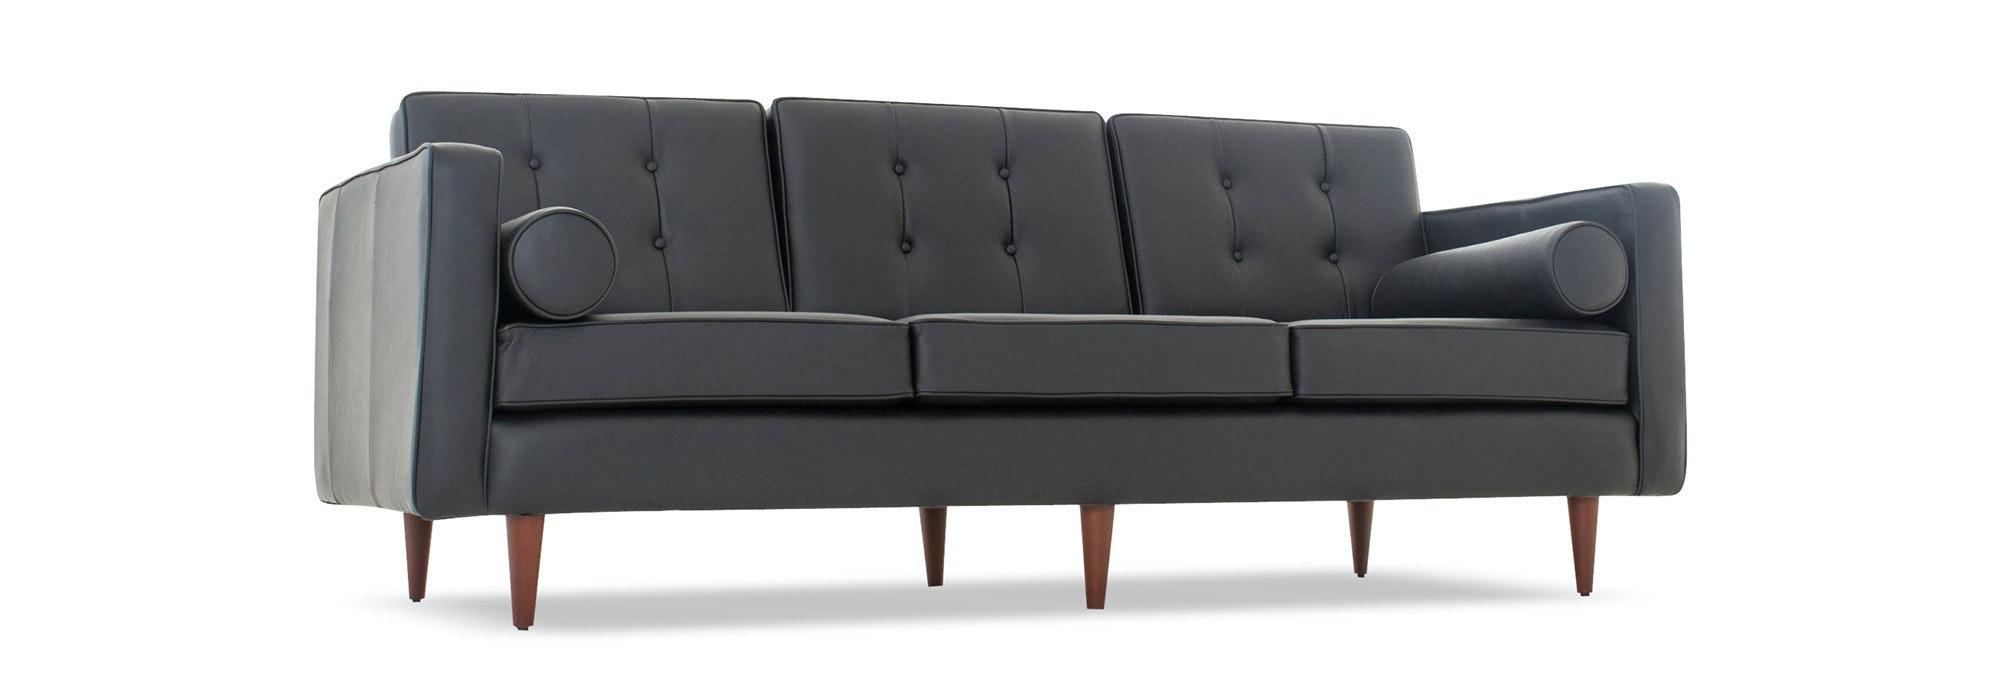 Braxton Leather Sofa Joybird